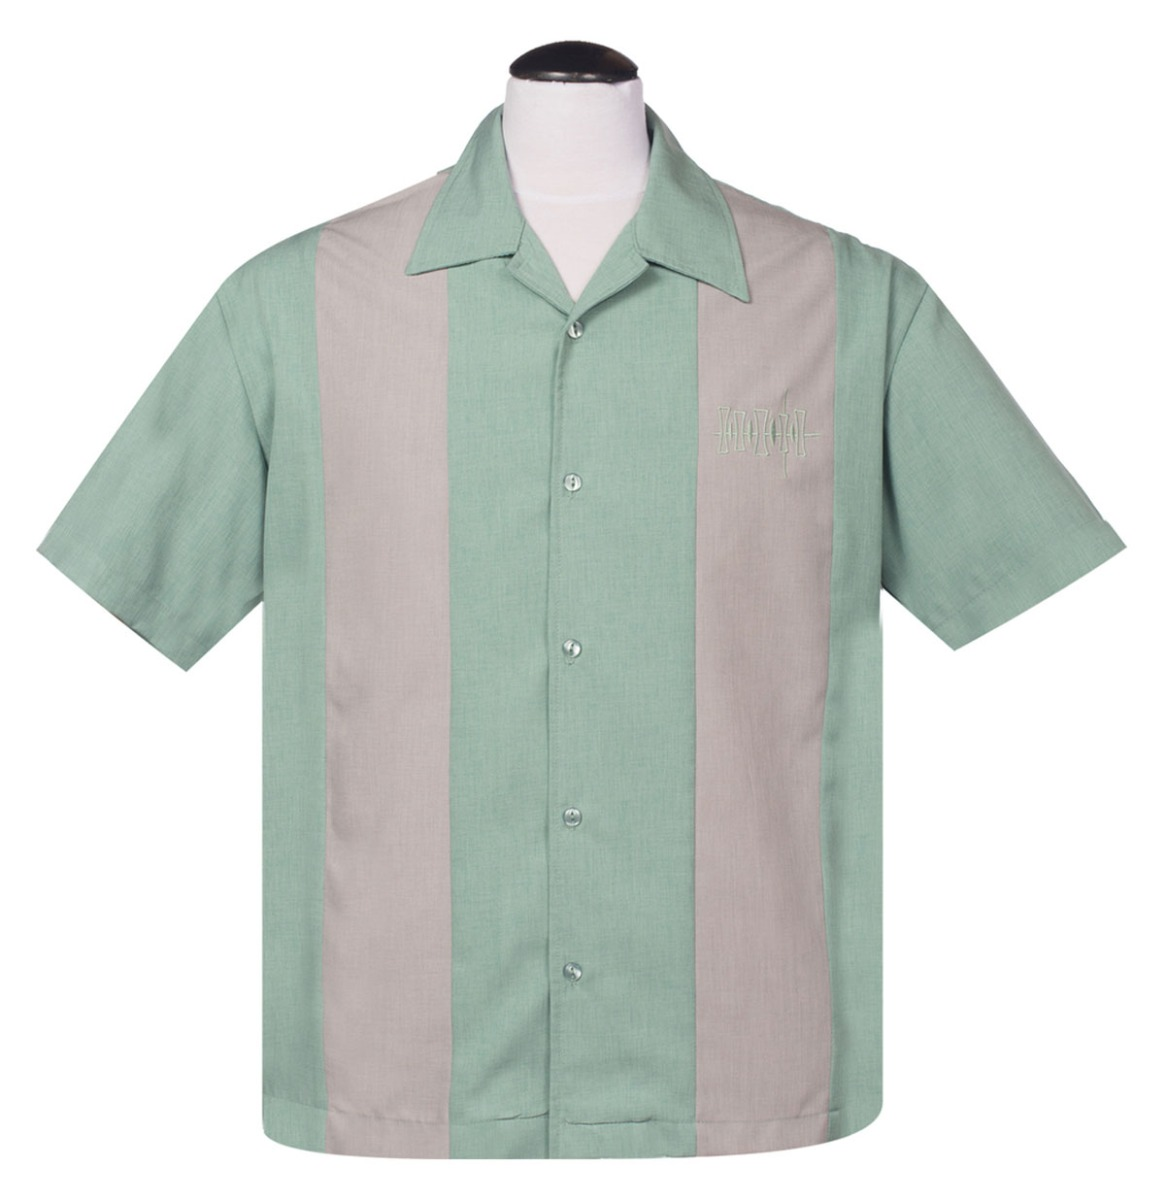 Simple Times Shirt, Mint